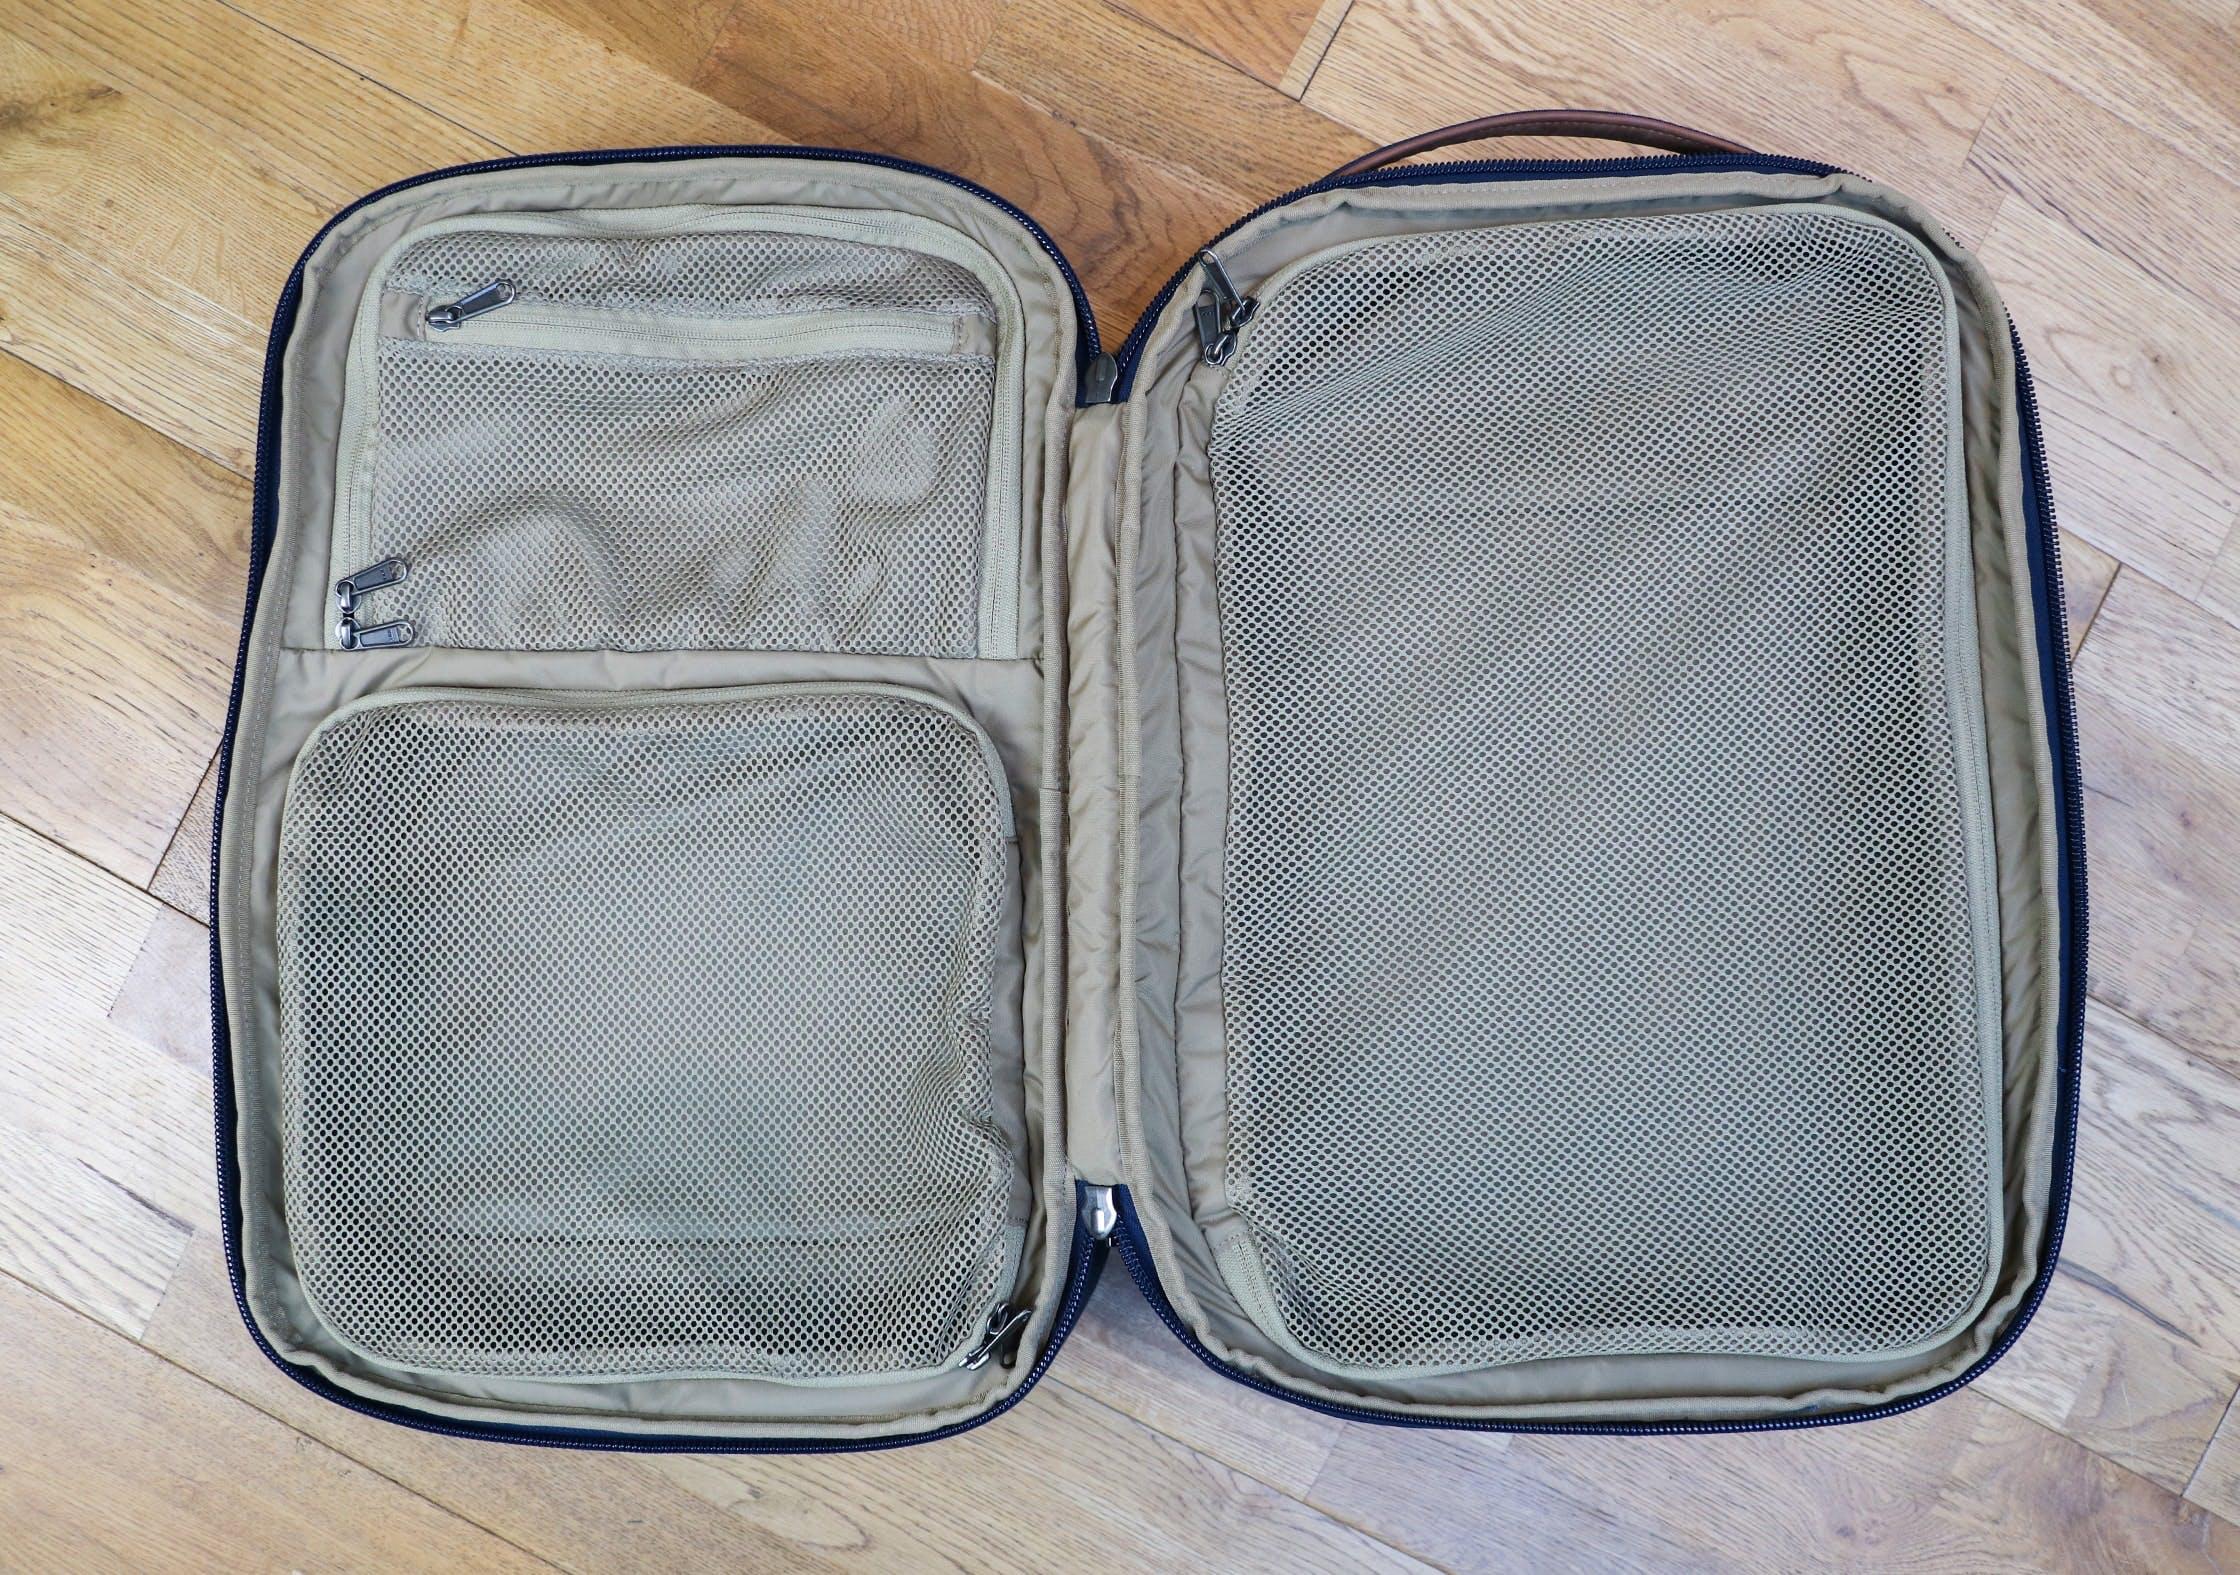 Fjallraven Travel Pack Internal Organization